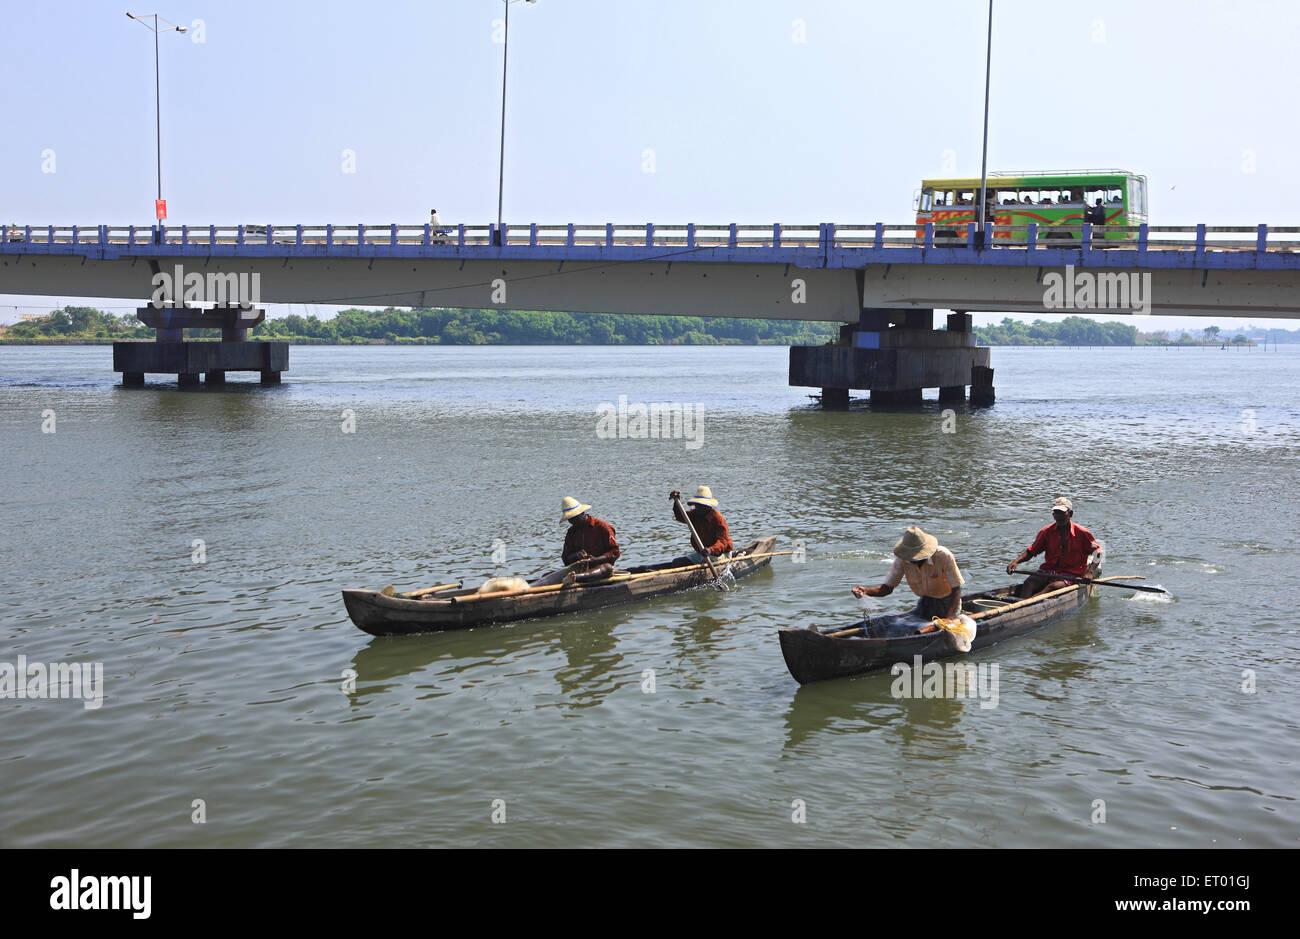 Fishing boats moving in water with connecting bridge ; Yipin island ; Kerala ; India - Stock Image